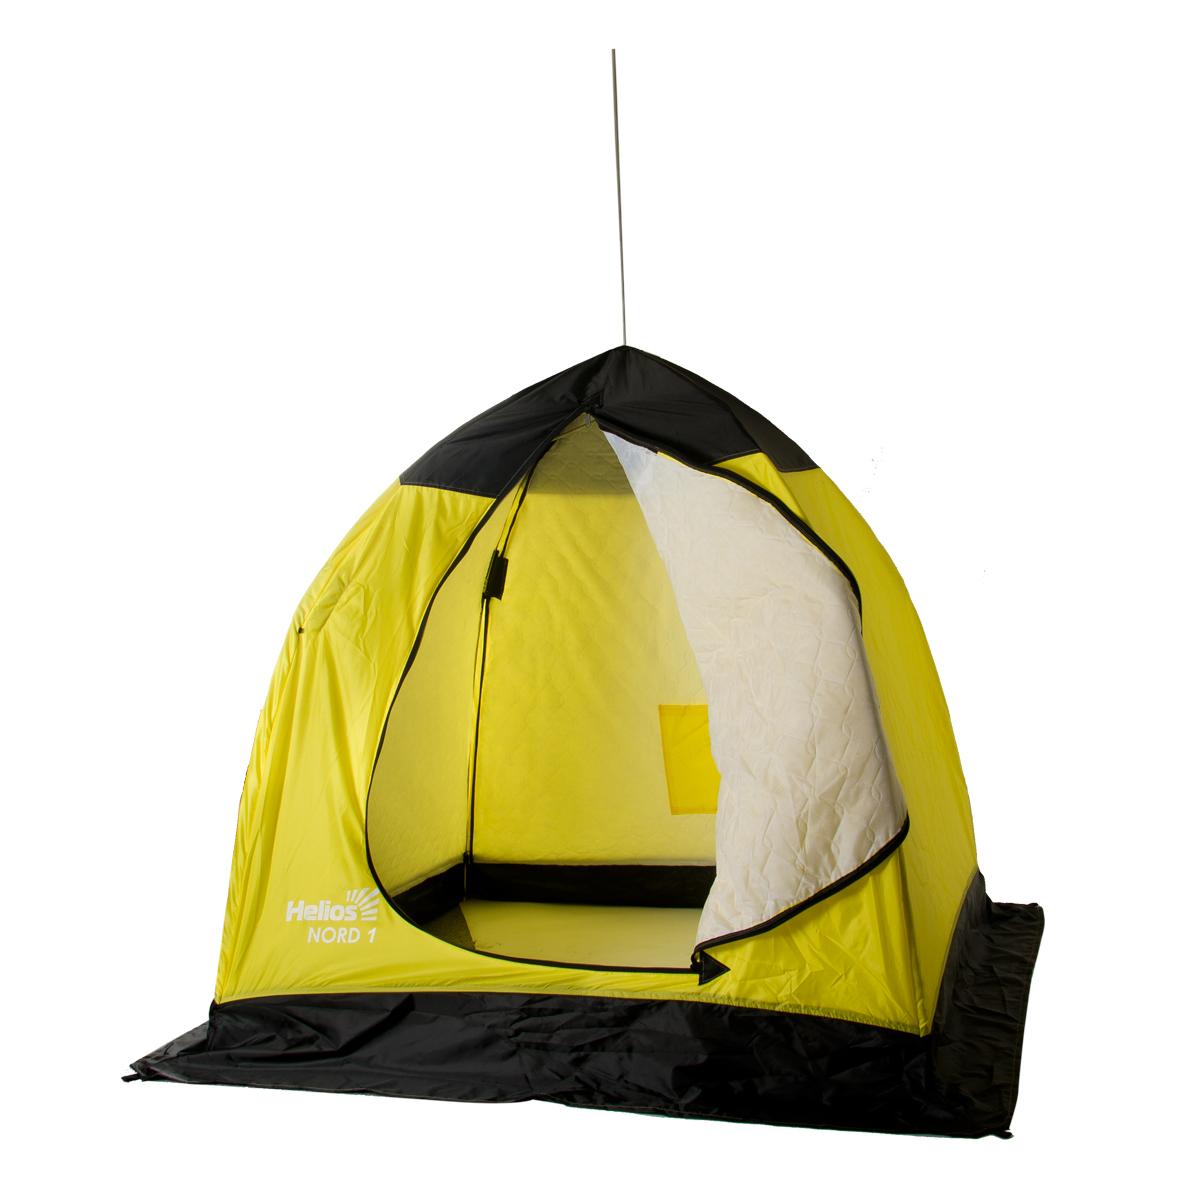 Палатка-зонт зимняя утепленная NORD-1 Helios (1-местная), Палатки для охоты и рыбалки - арт. 1128250375